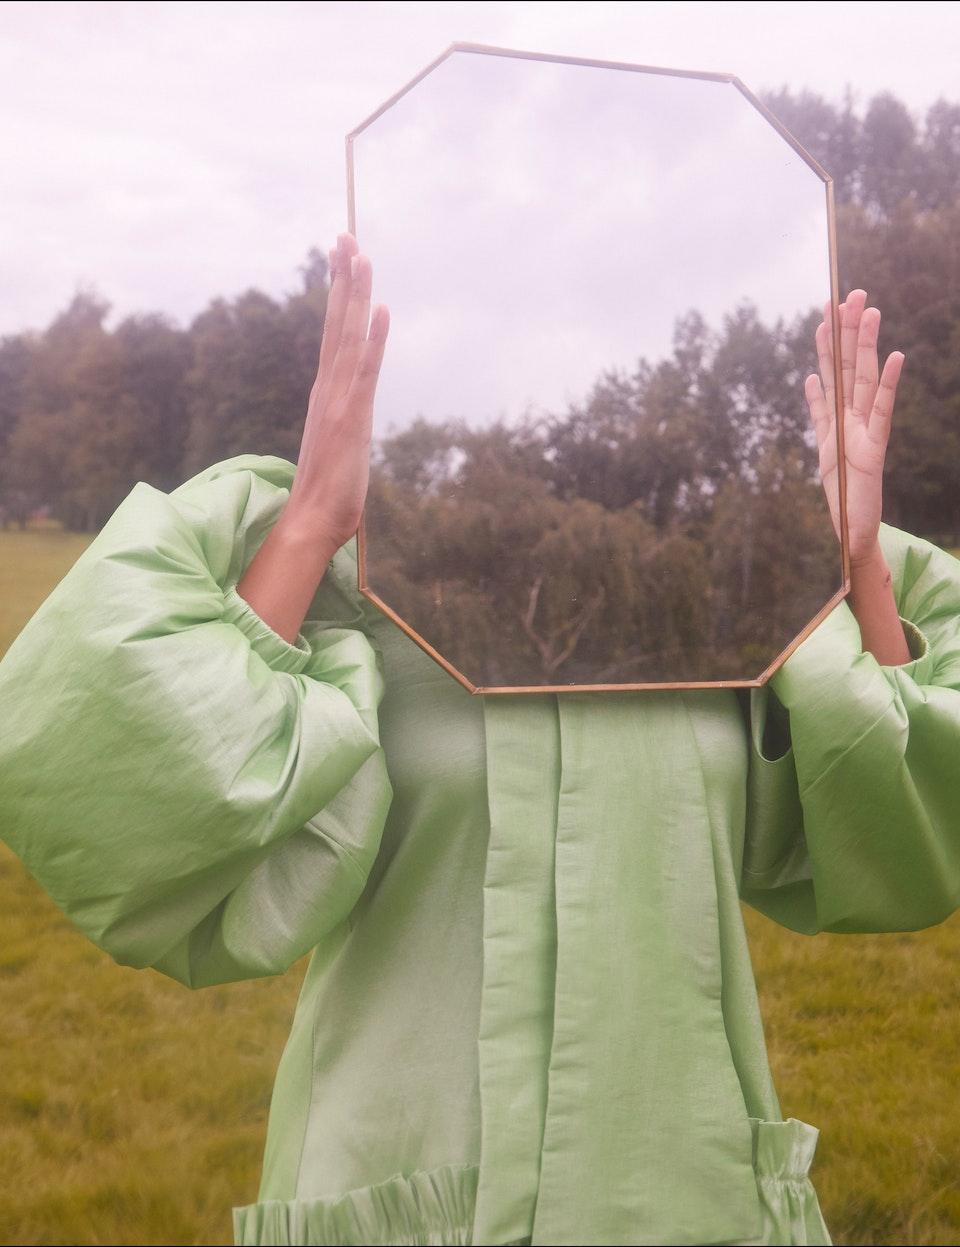 Reflection_015 -